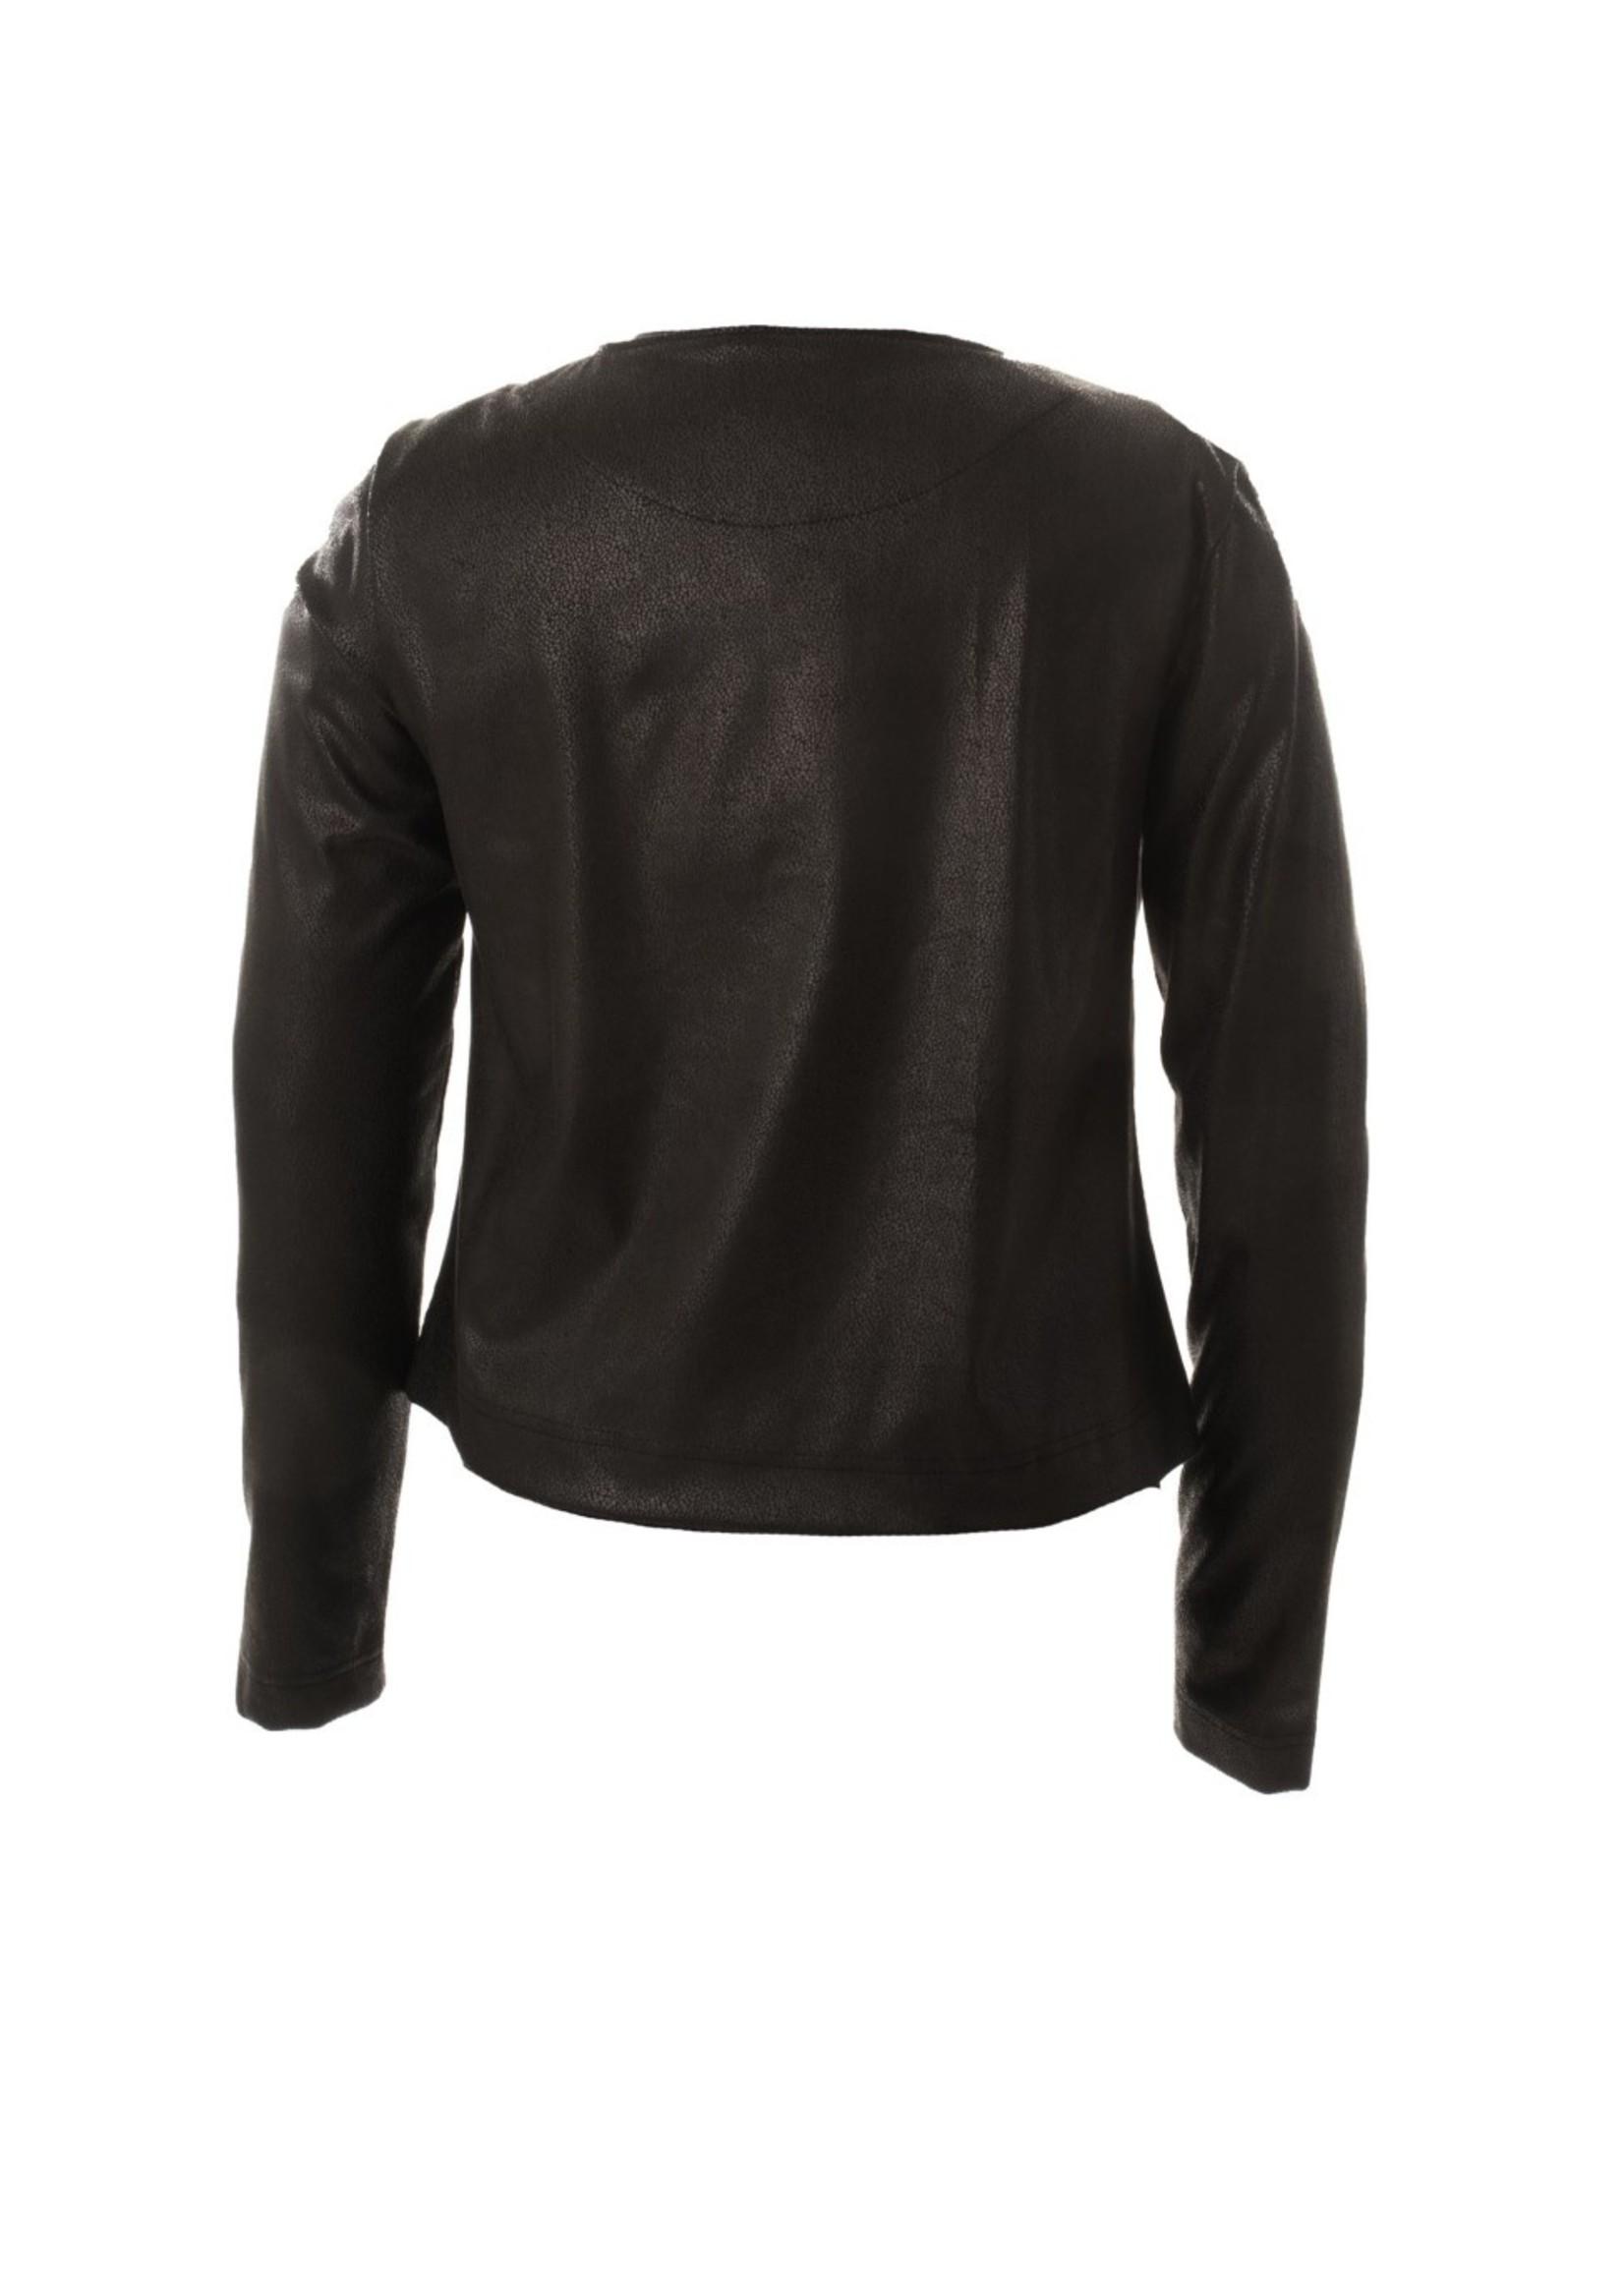 MOOI VROLIJK 20435 MV jasje basic black leather